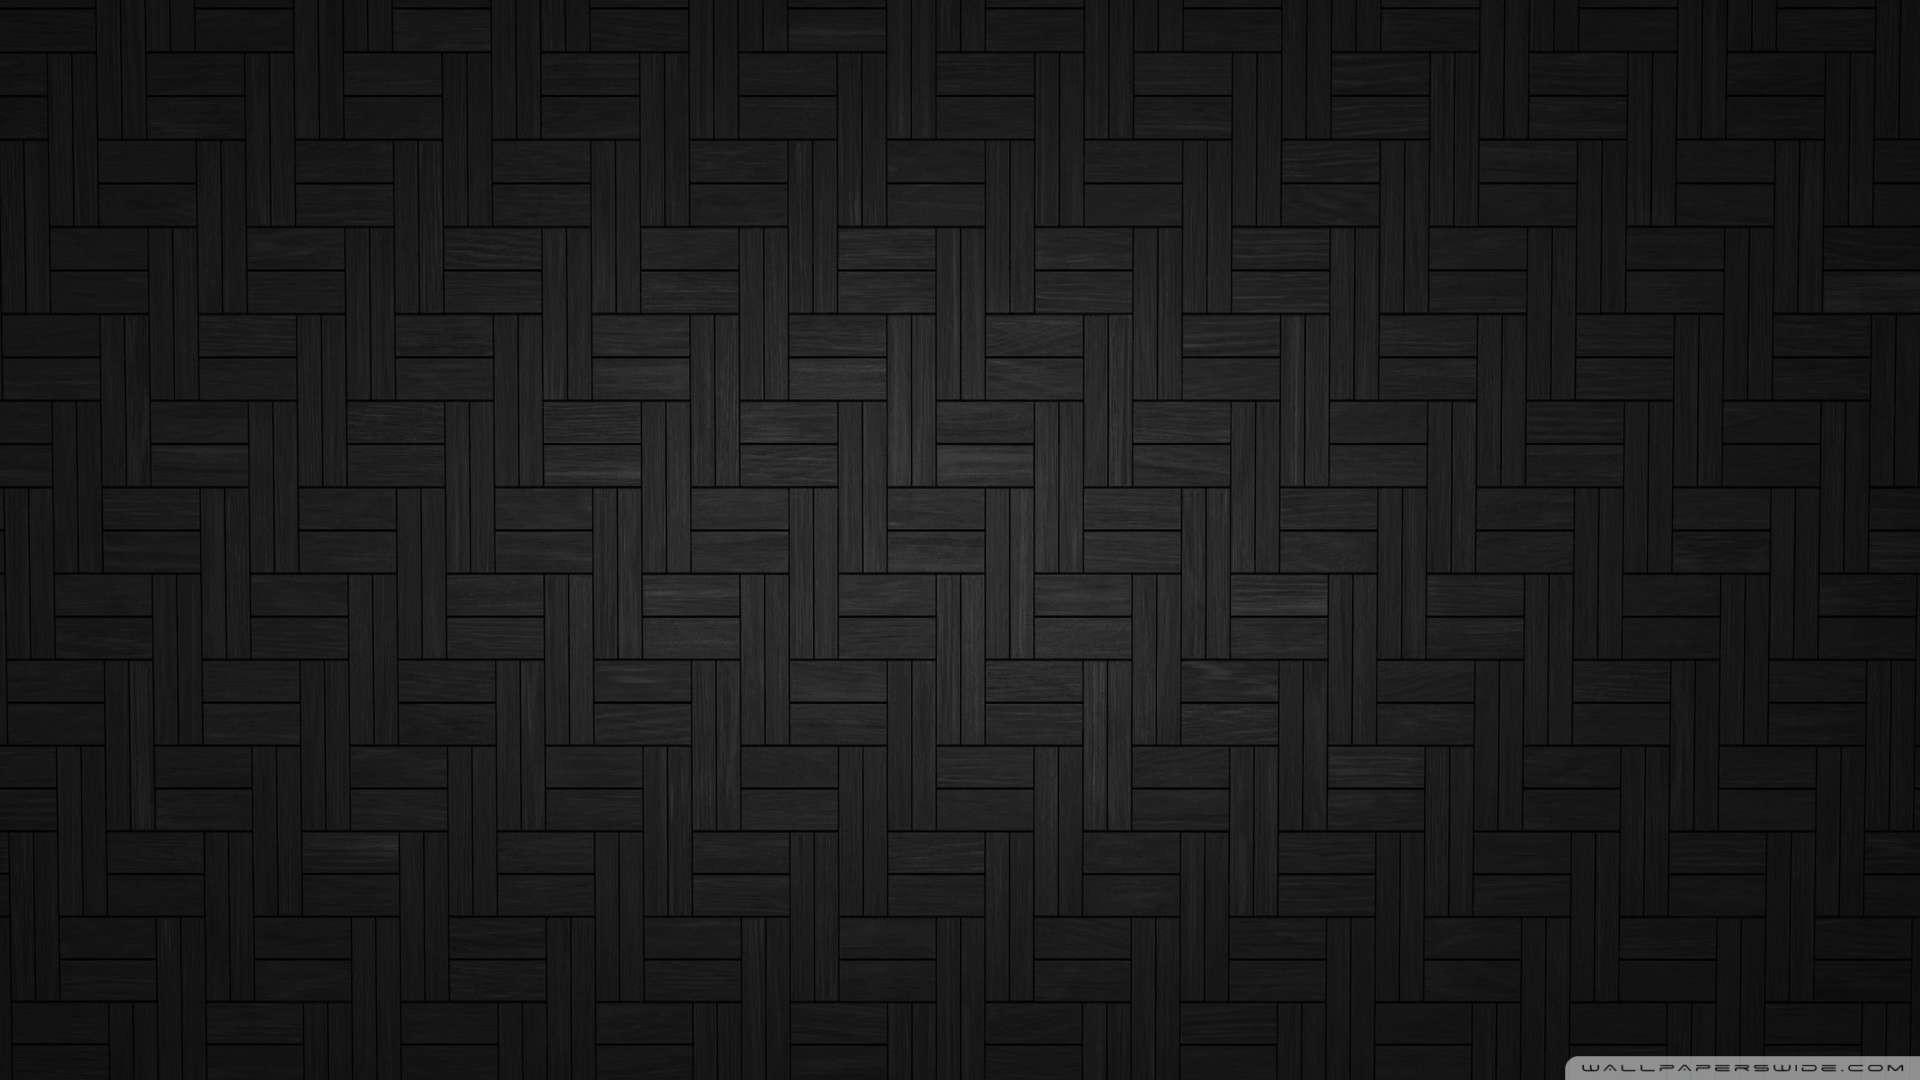 Wallpaper: Black Texture 3 Wallpaper 1080p HD. Upload at December 31 .